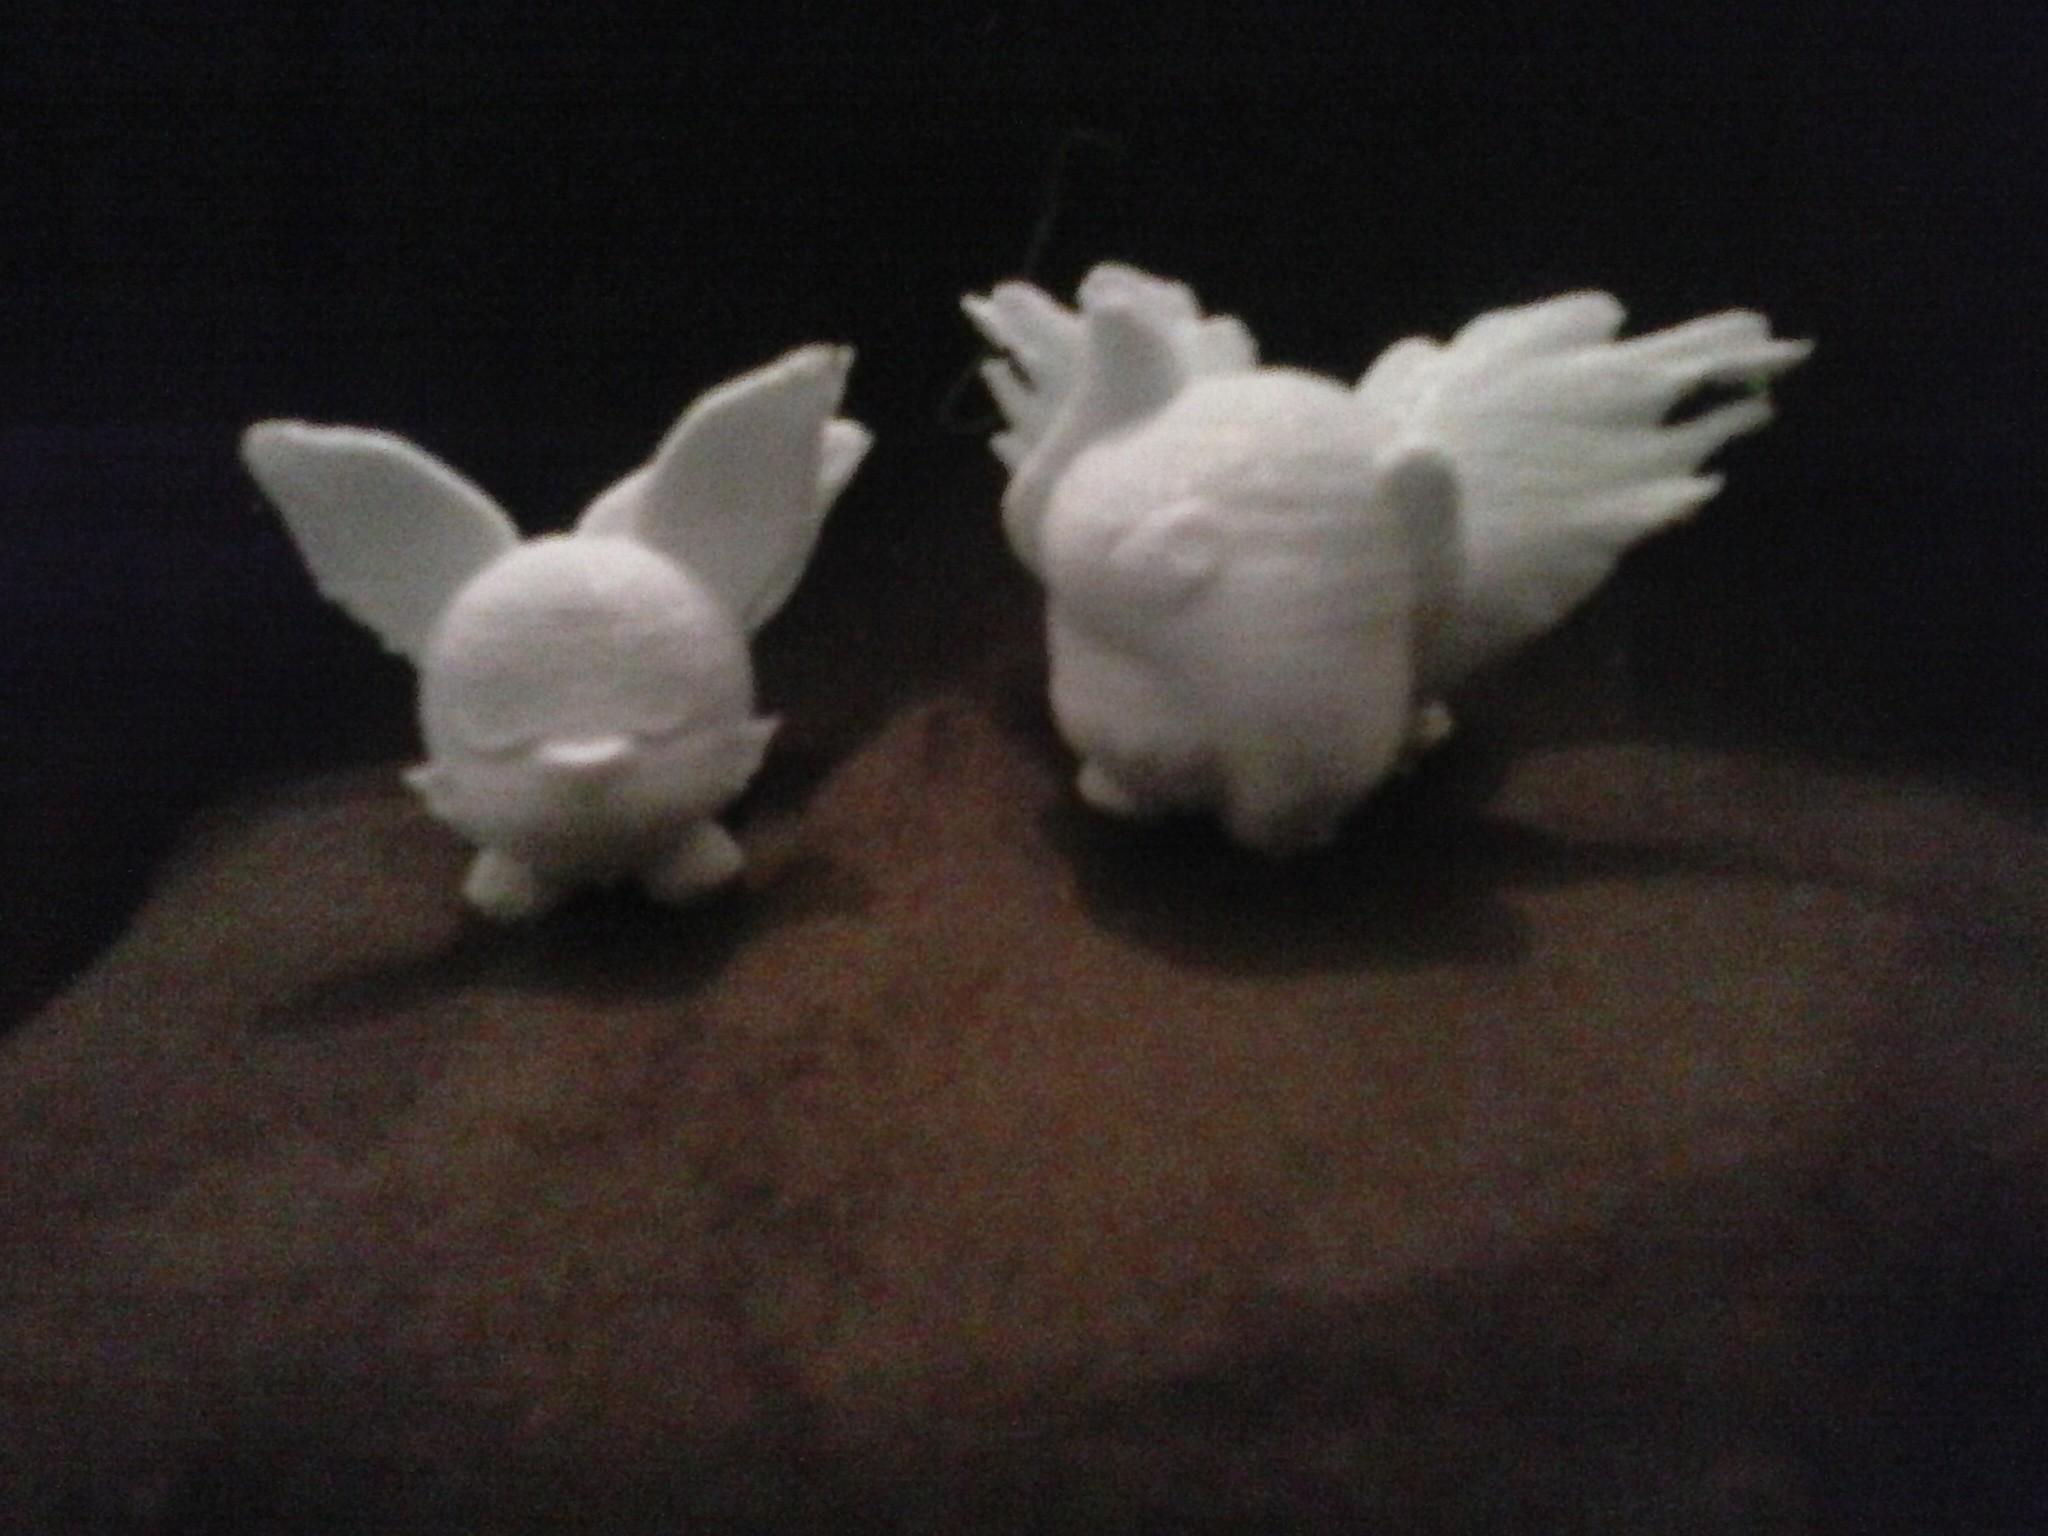 feunnec absol.jpg Download STL file Pickachu • 3D printable design, Majin59